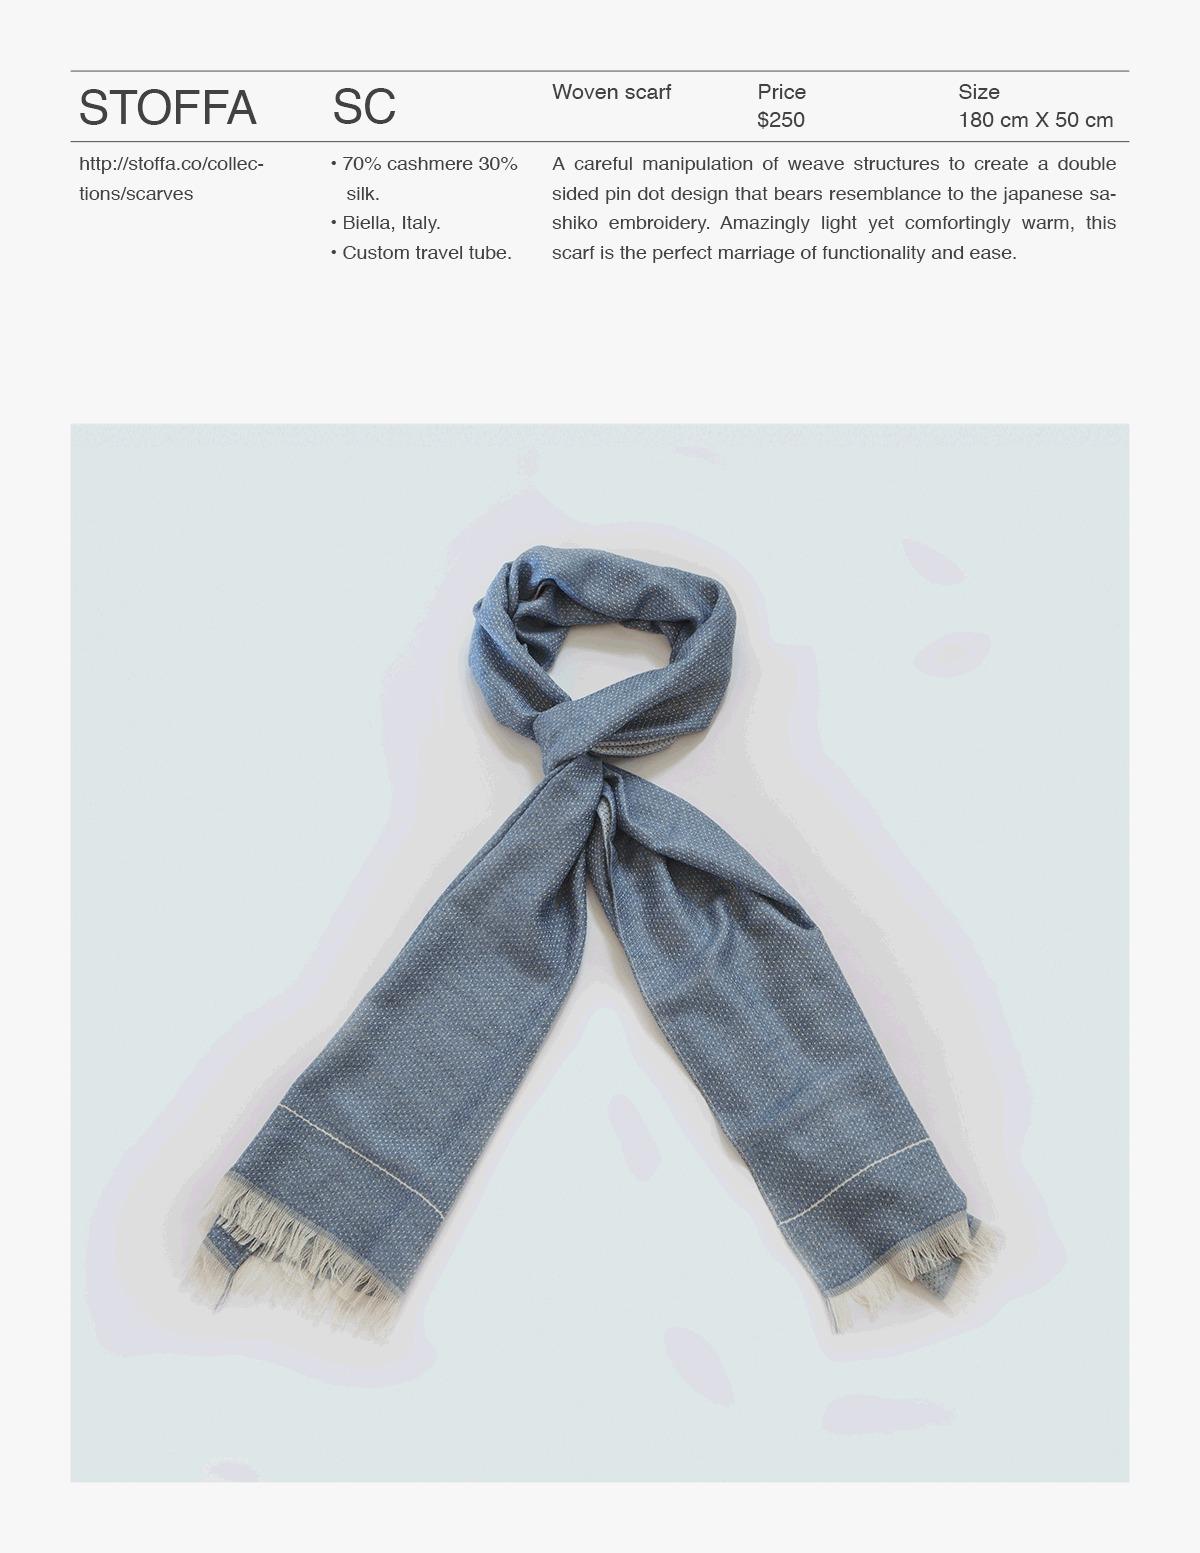 la-stoffa :     Stòffa Catalog - Scarves